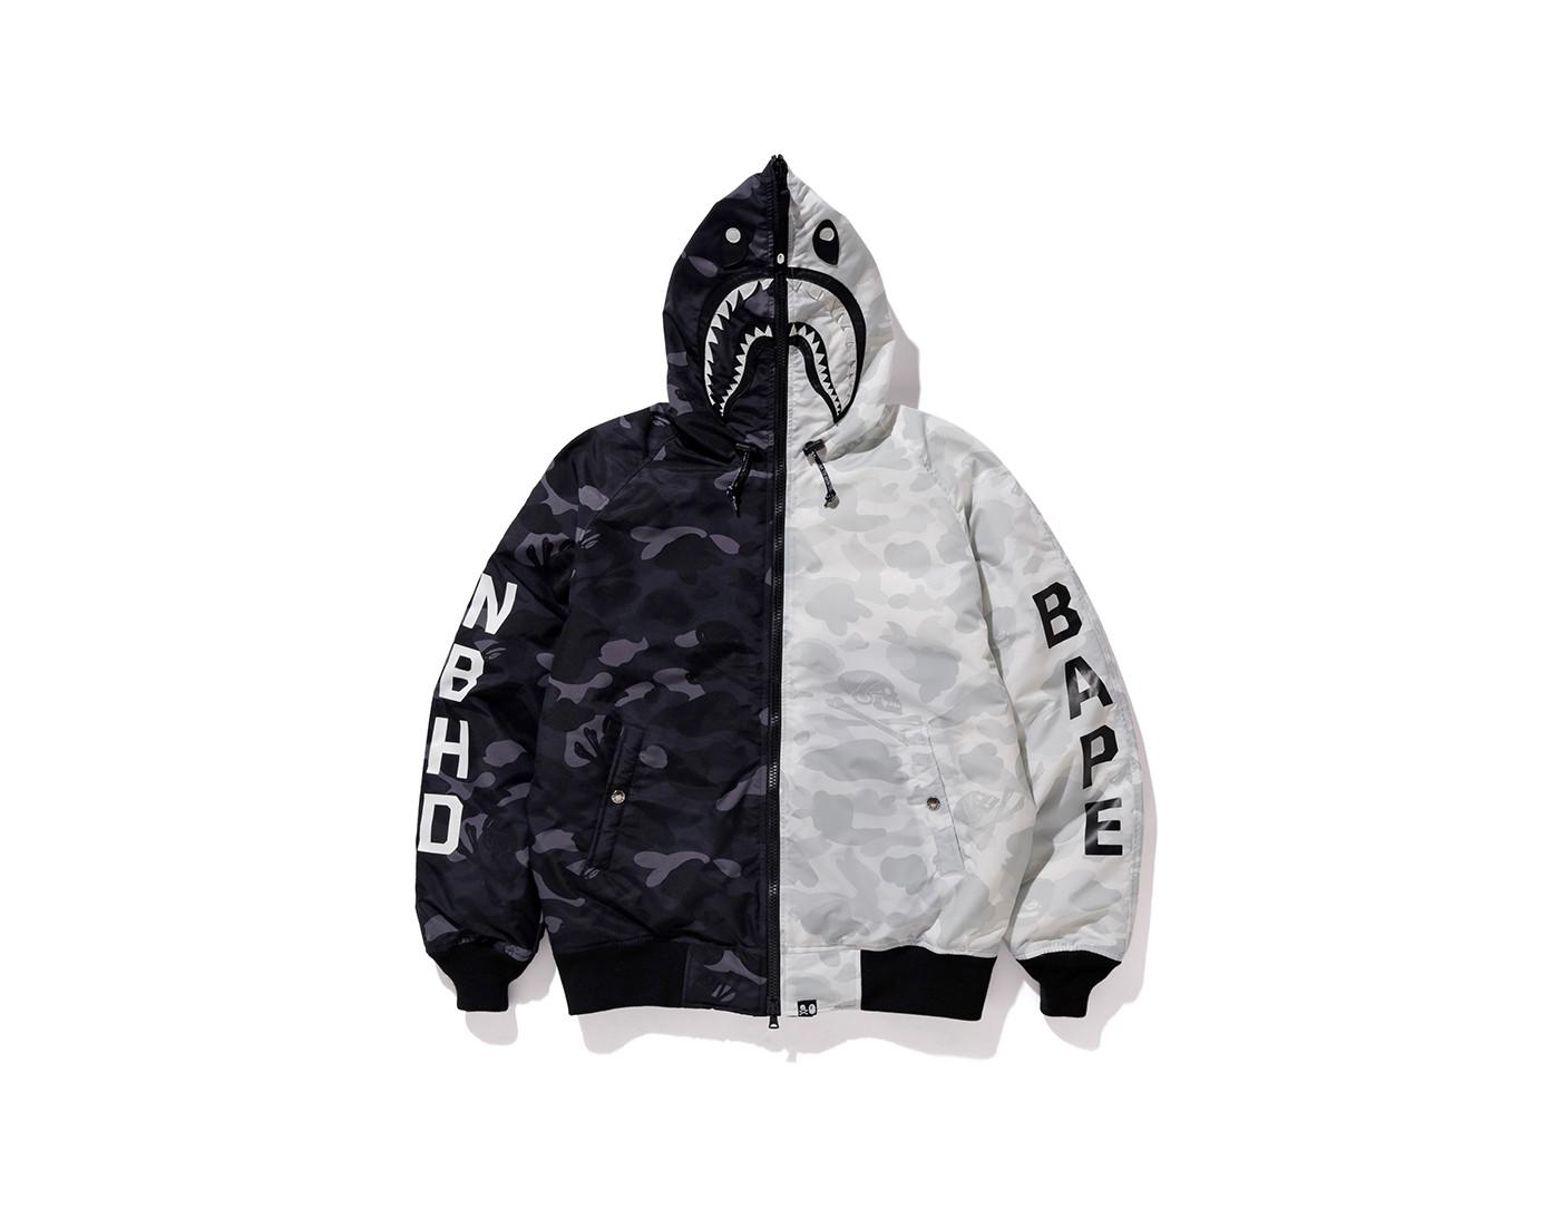 864ff8f28 A Bathing Ape X Neighborhood Down Shark Jacket Black/white in Black for Men  - Lyst